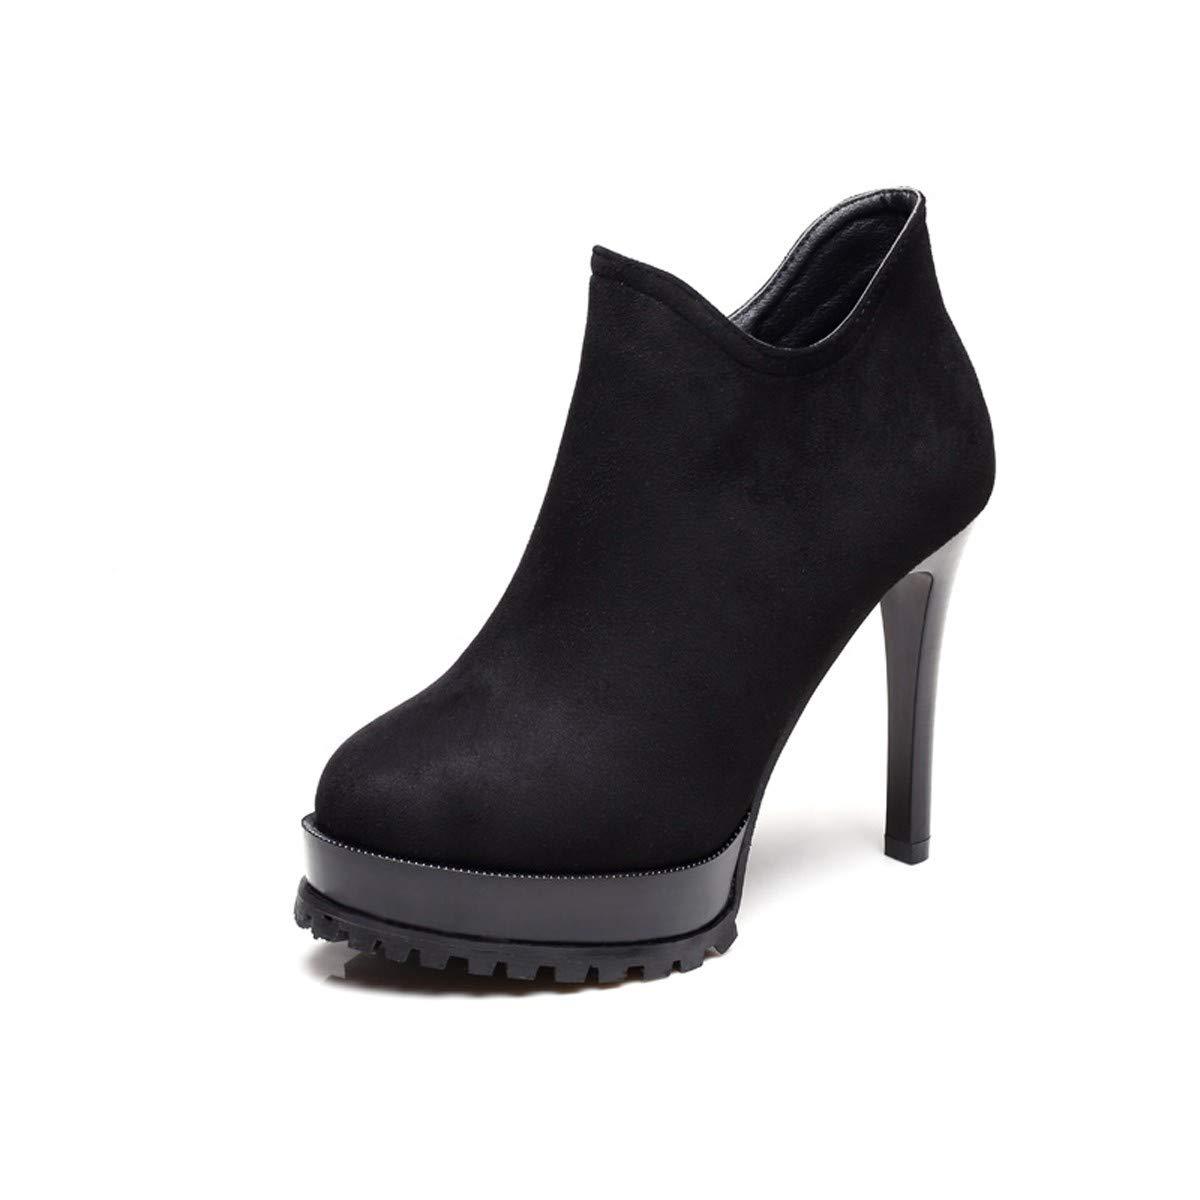 LBTSQ-Kurze Stiefel High Heels 11Cm Runden Kopf Damenschuhe Dünn Und Wasserdichte Plattformen Tiefe Schuhe Mode.